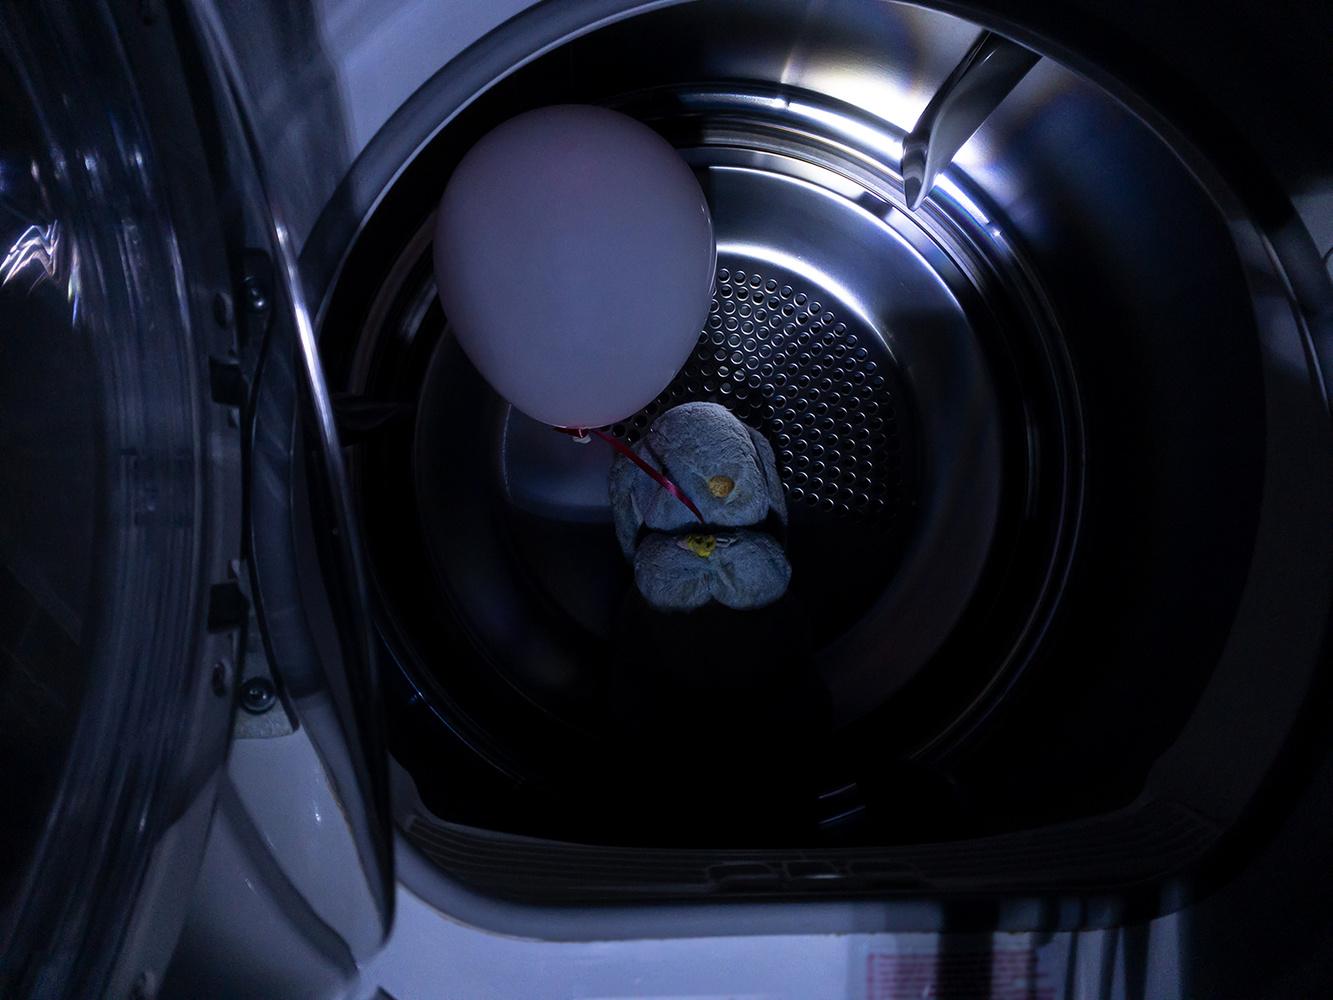 A hare inside a dryer machine by Yossi Schori